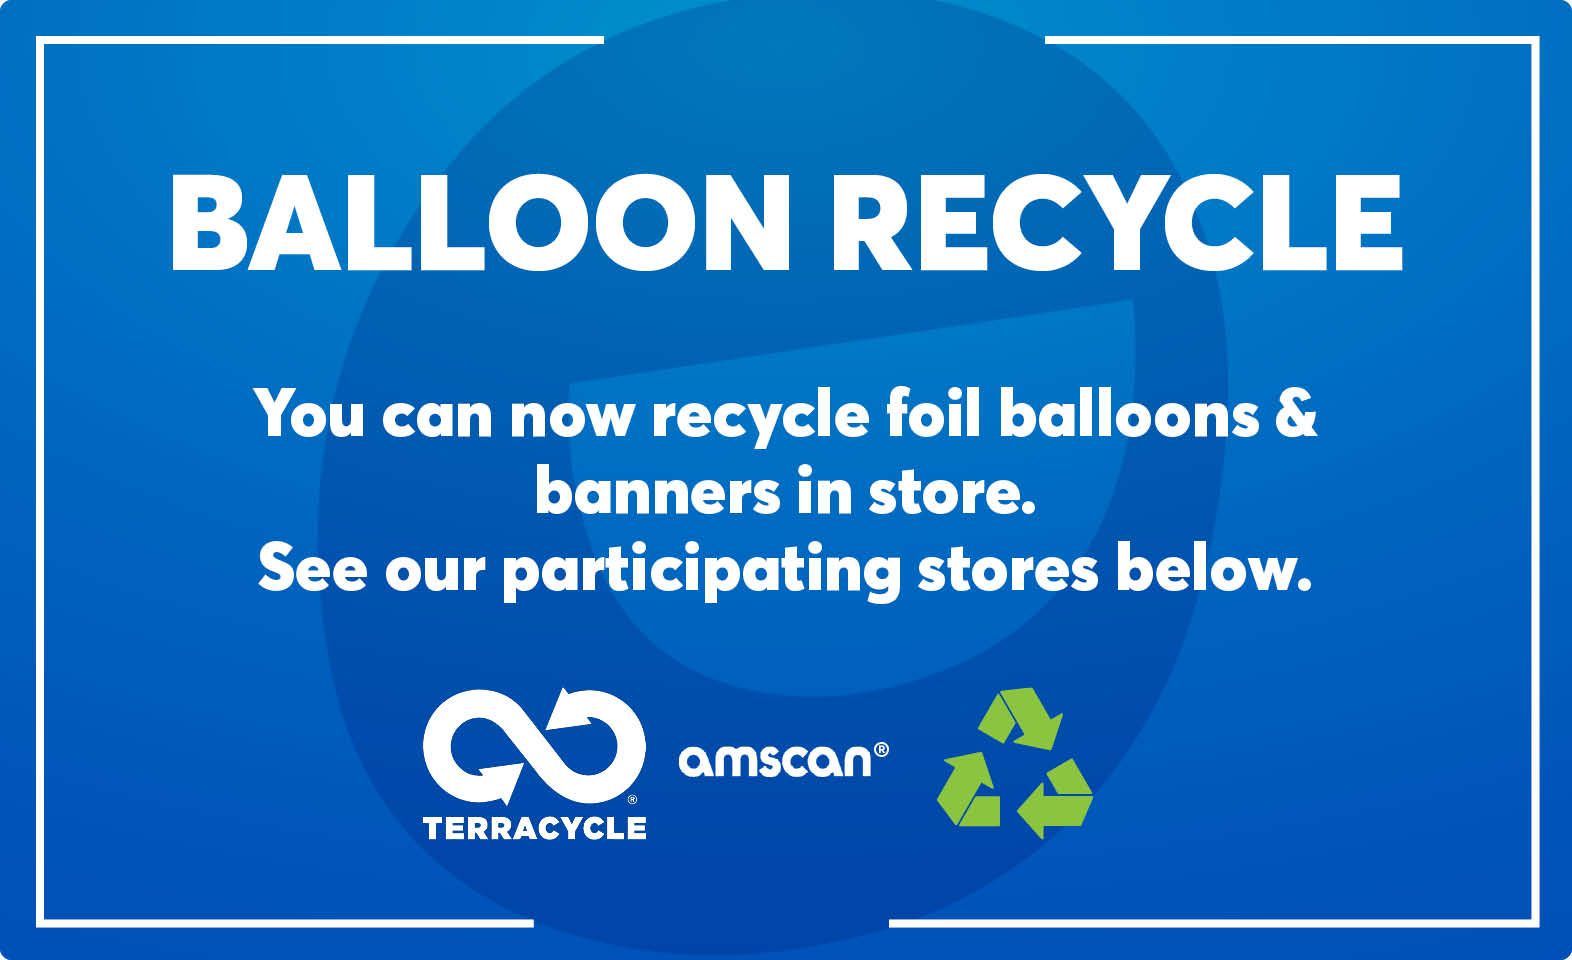 Balloon Recycling